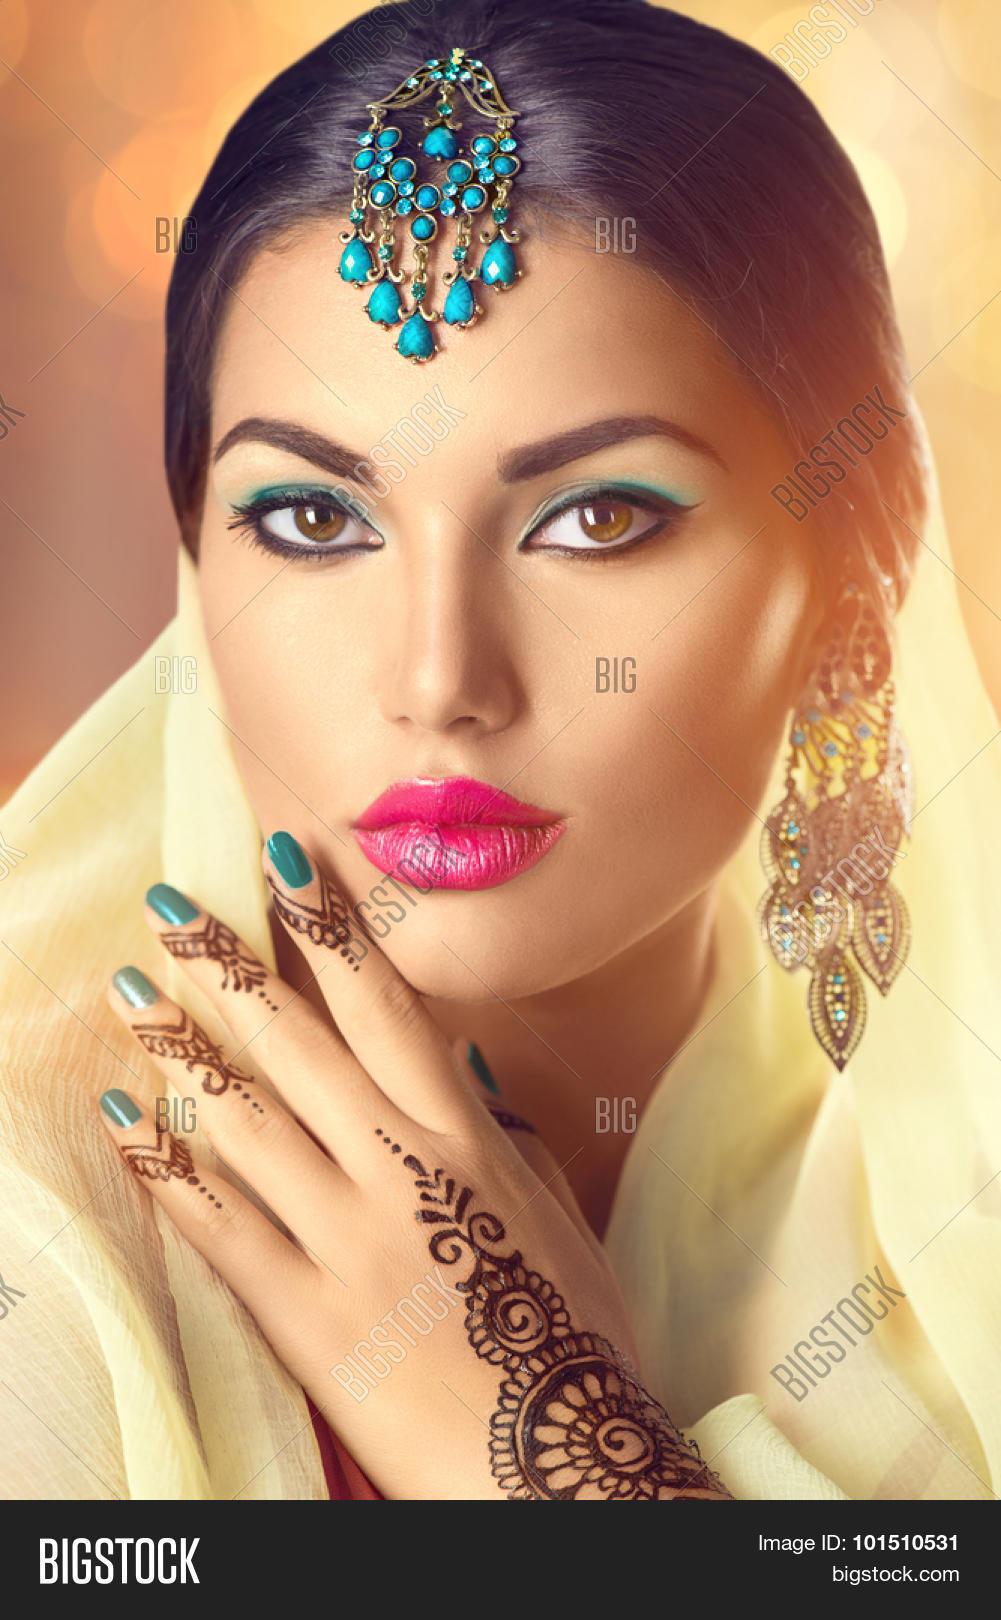 Beauty Indian Woman Image Photo Free Trial Bigstock